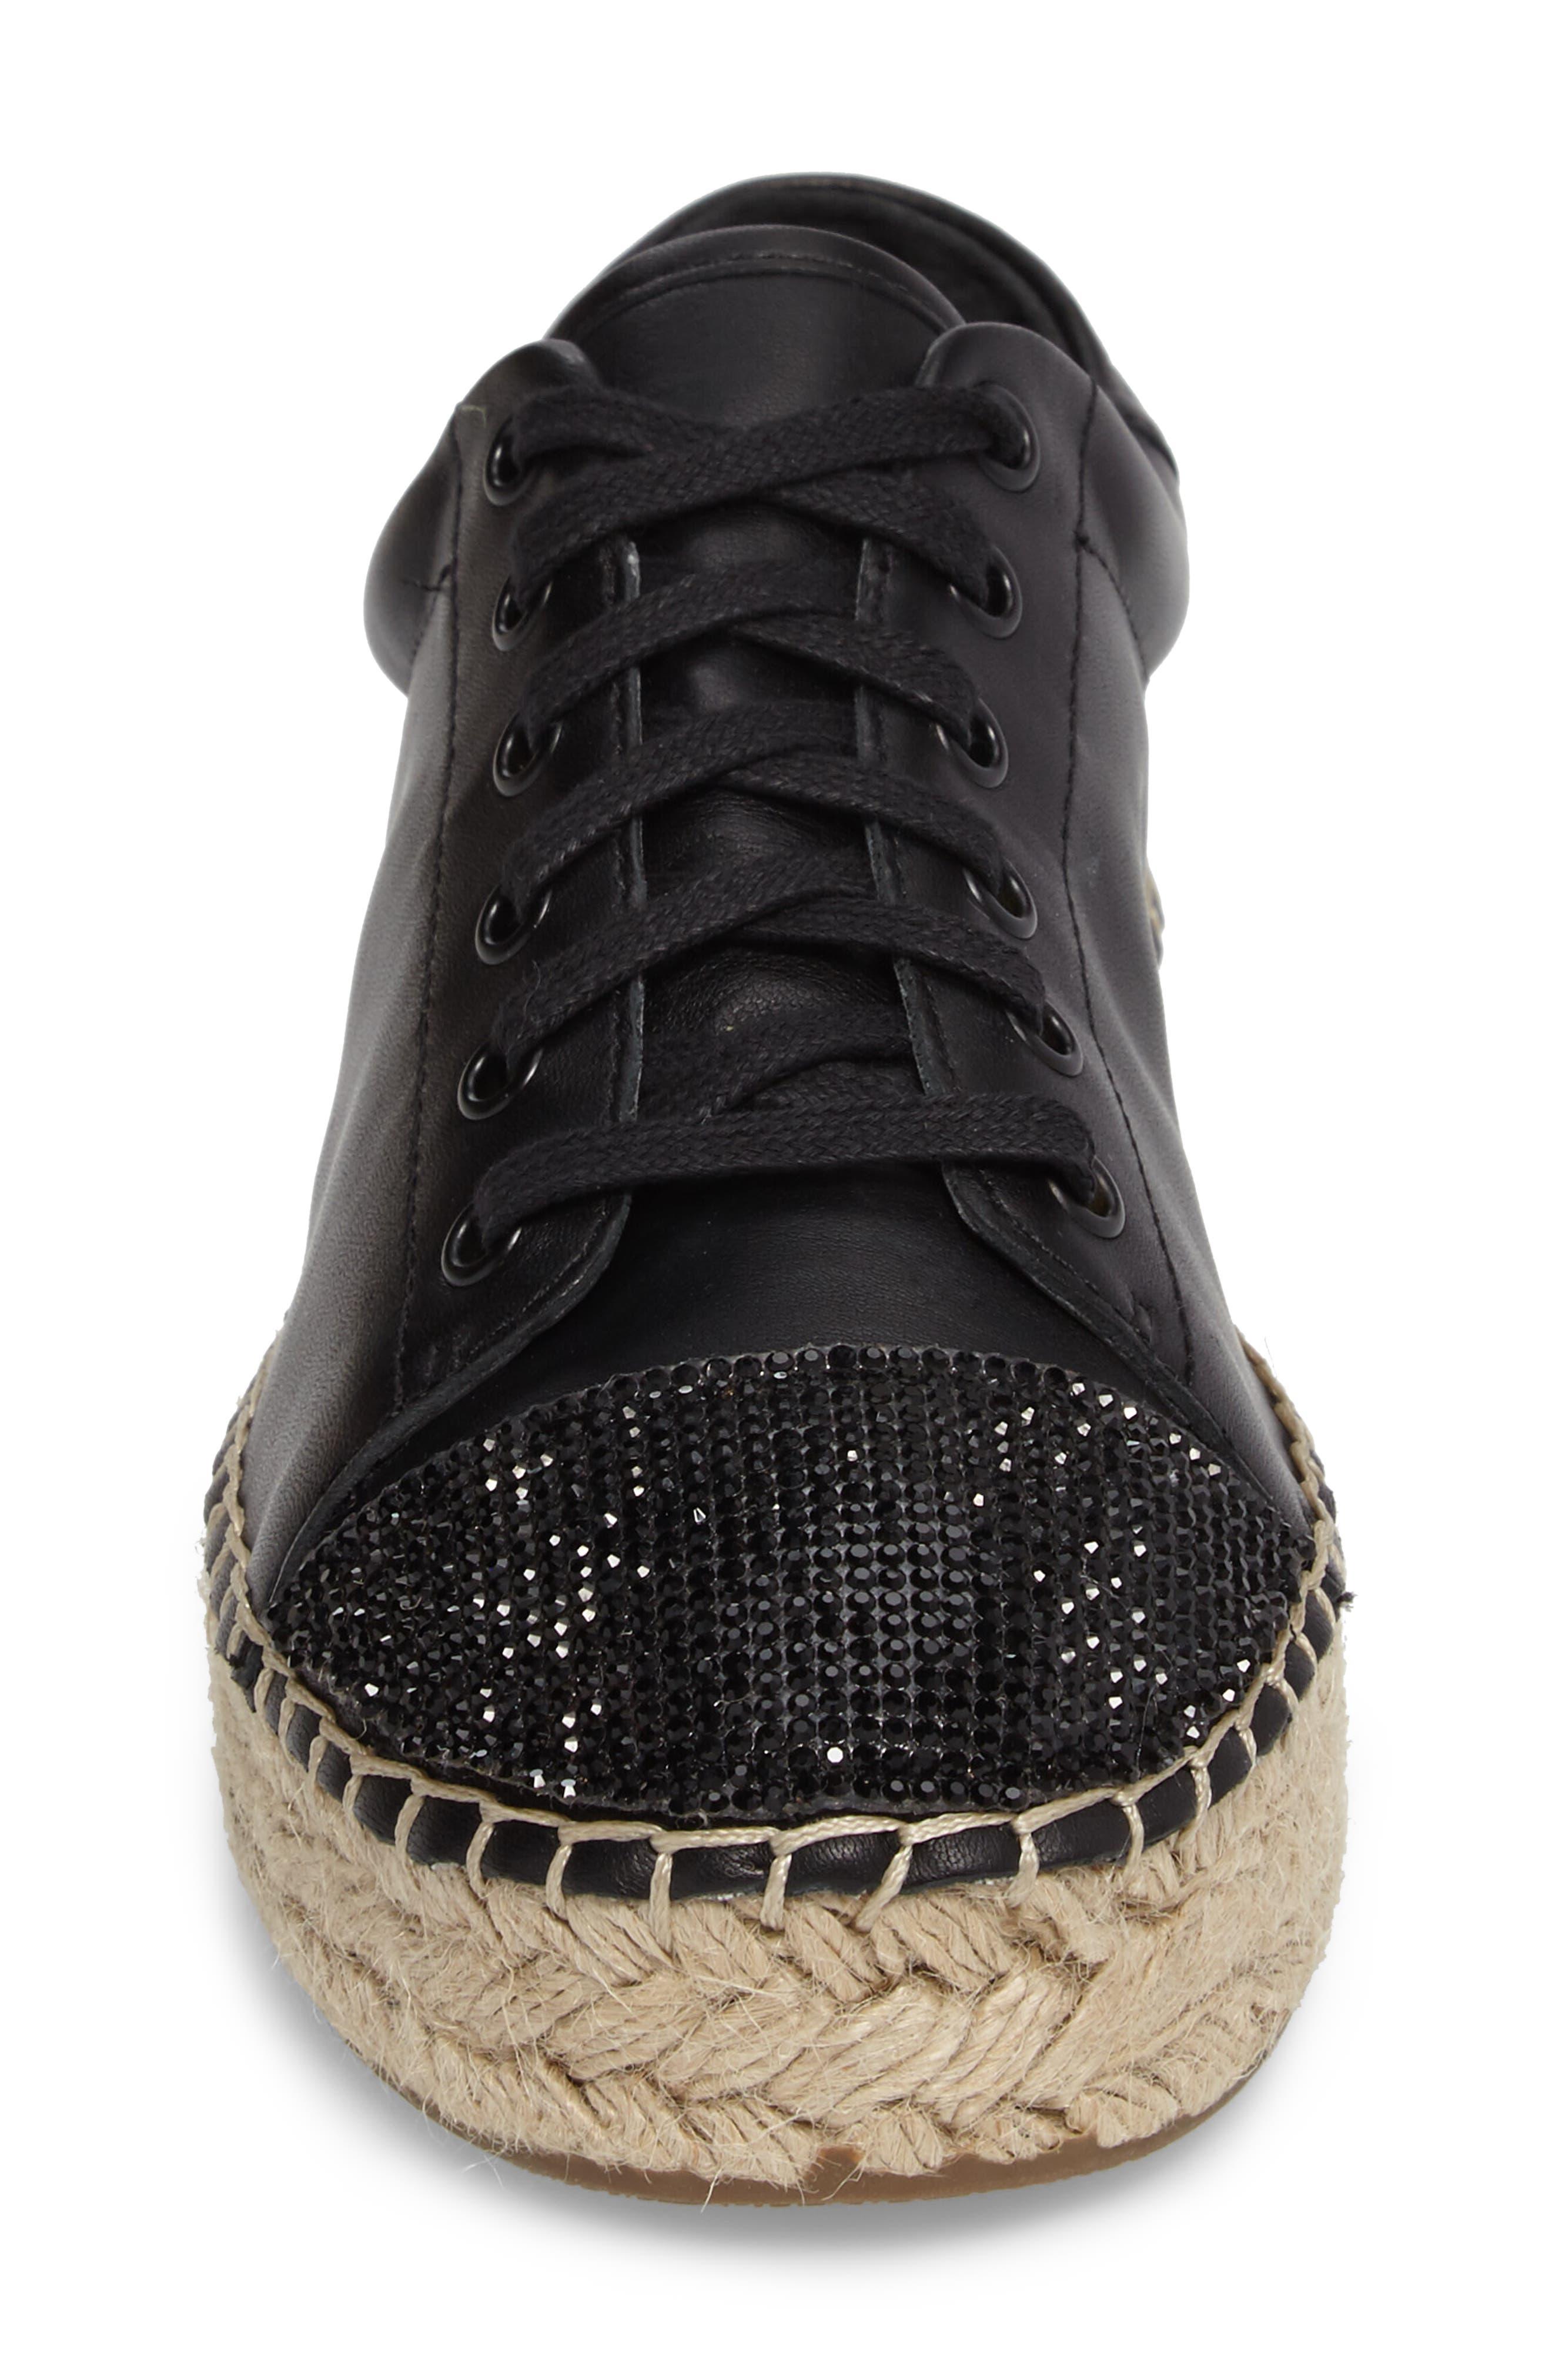 Joslyn Espadrille Sneaker,                             Alternate thumbnail 4, color,                             001